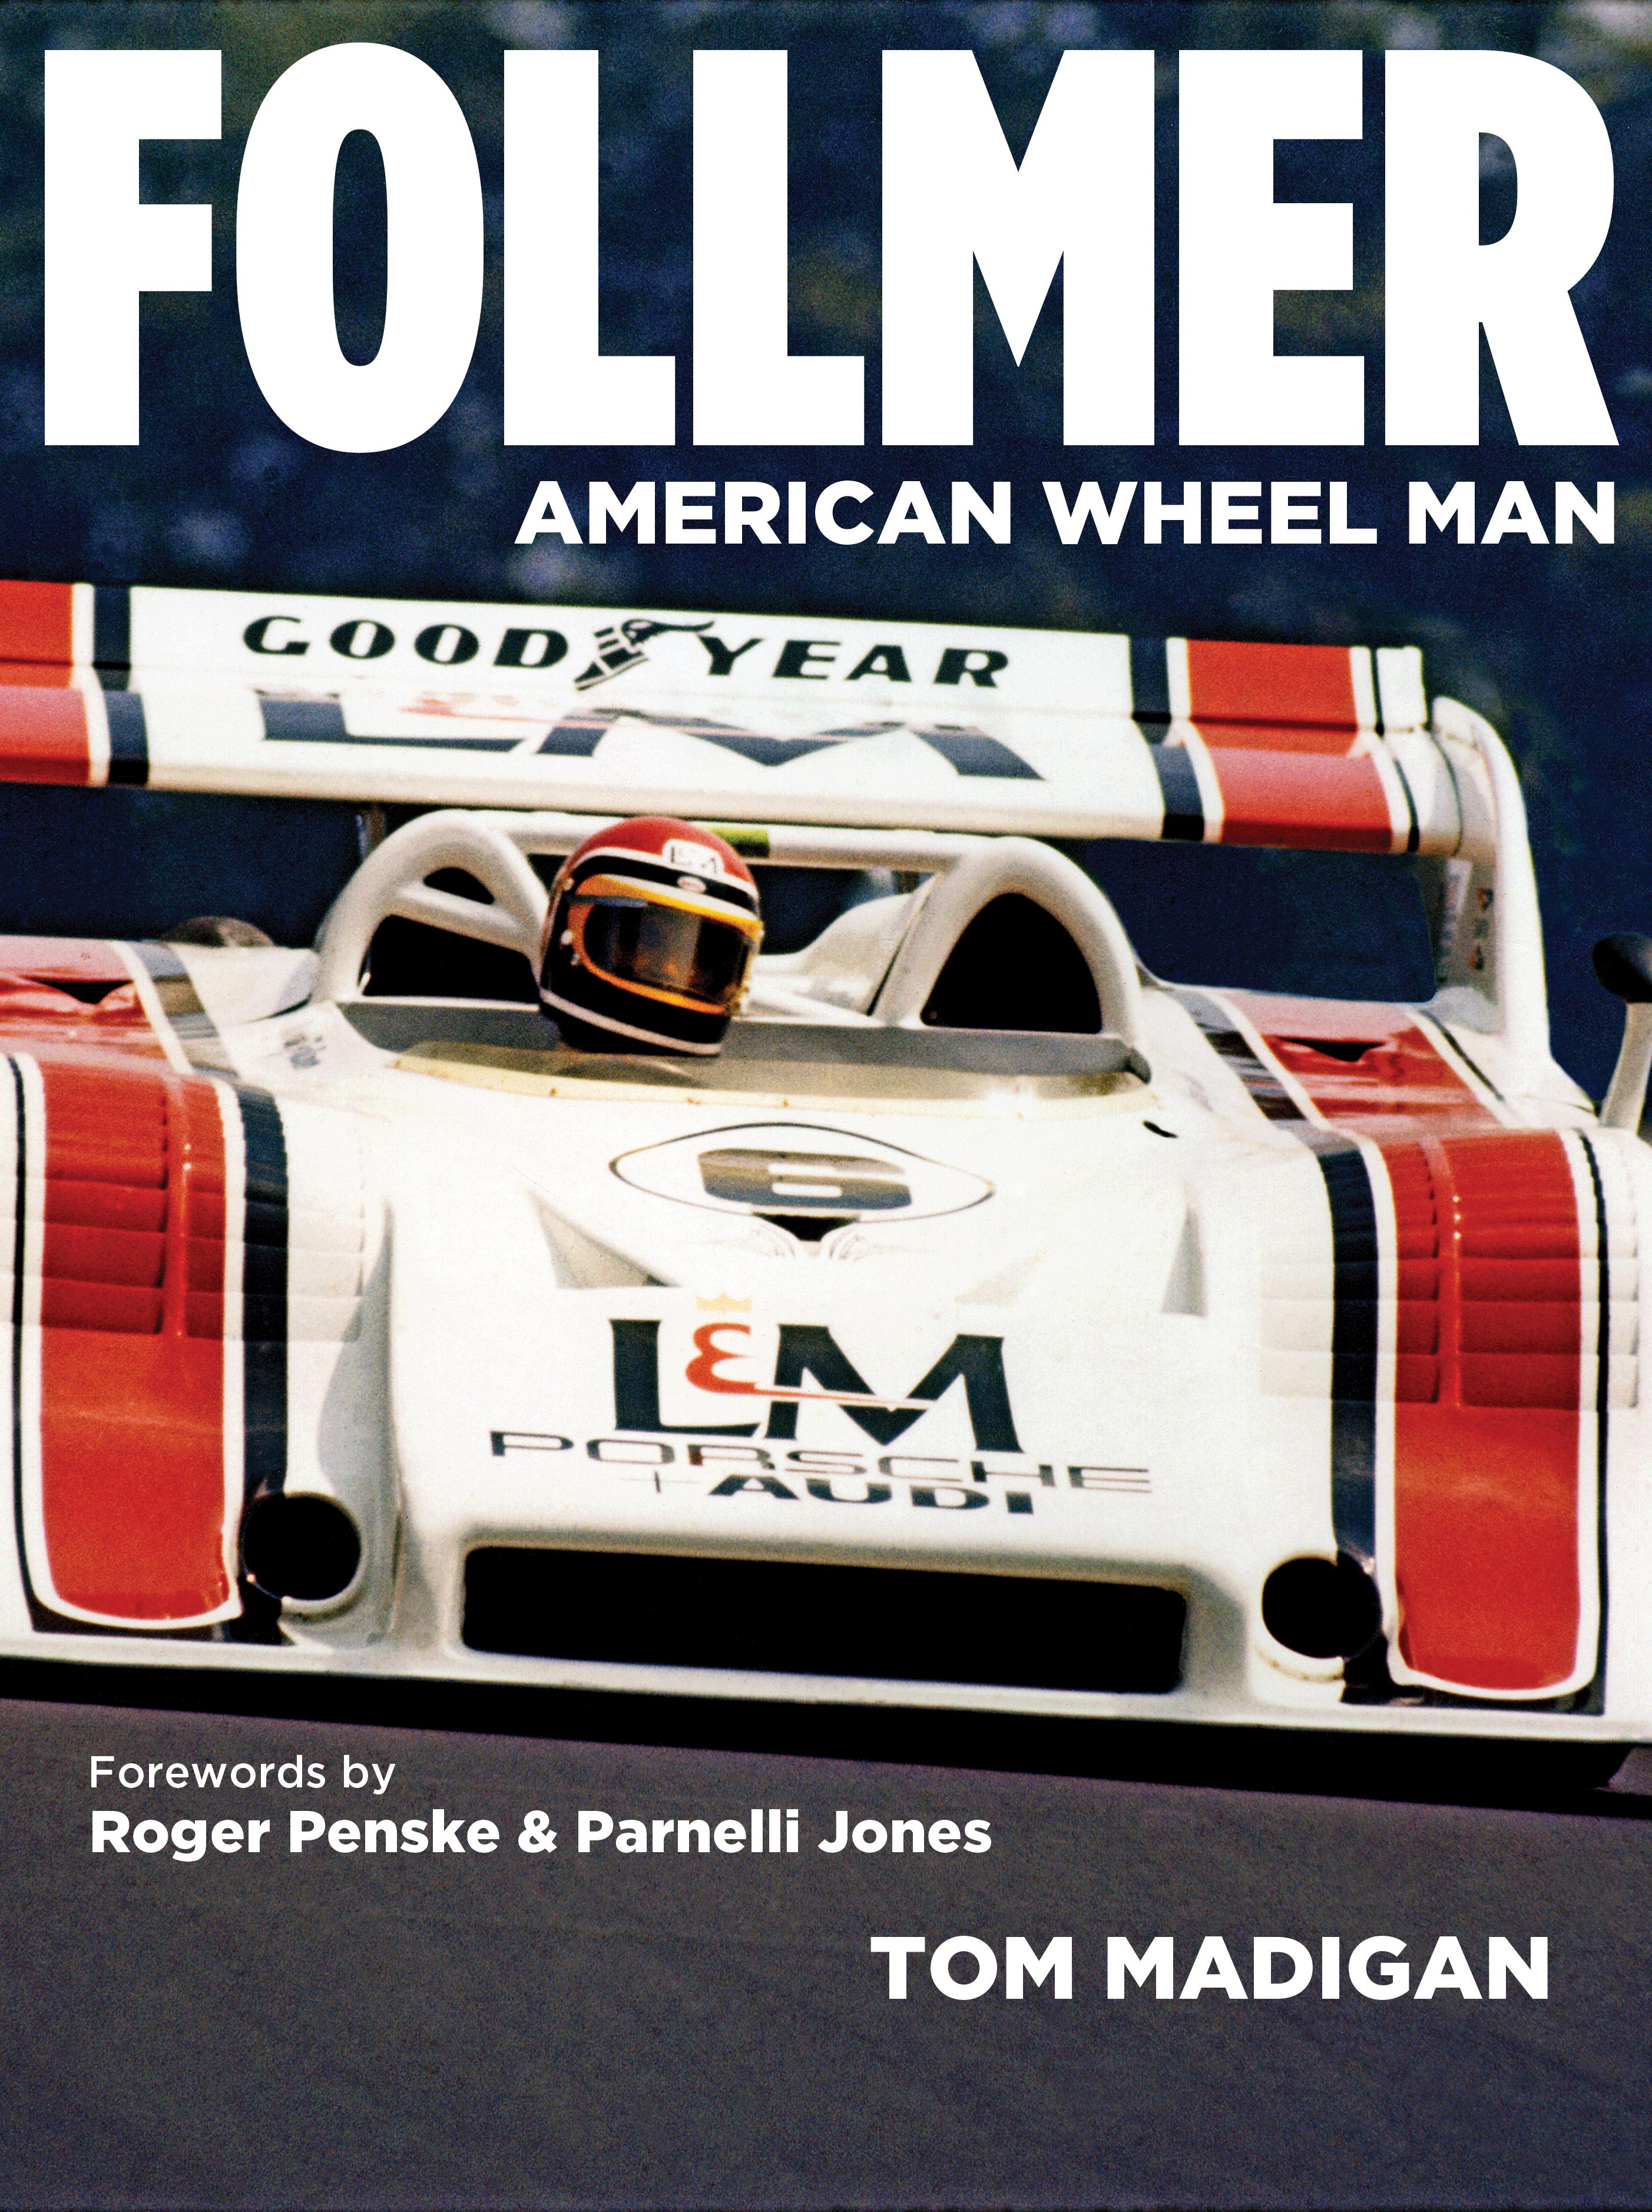 Review: George Follmer; American Wheelman